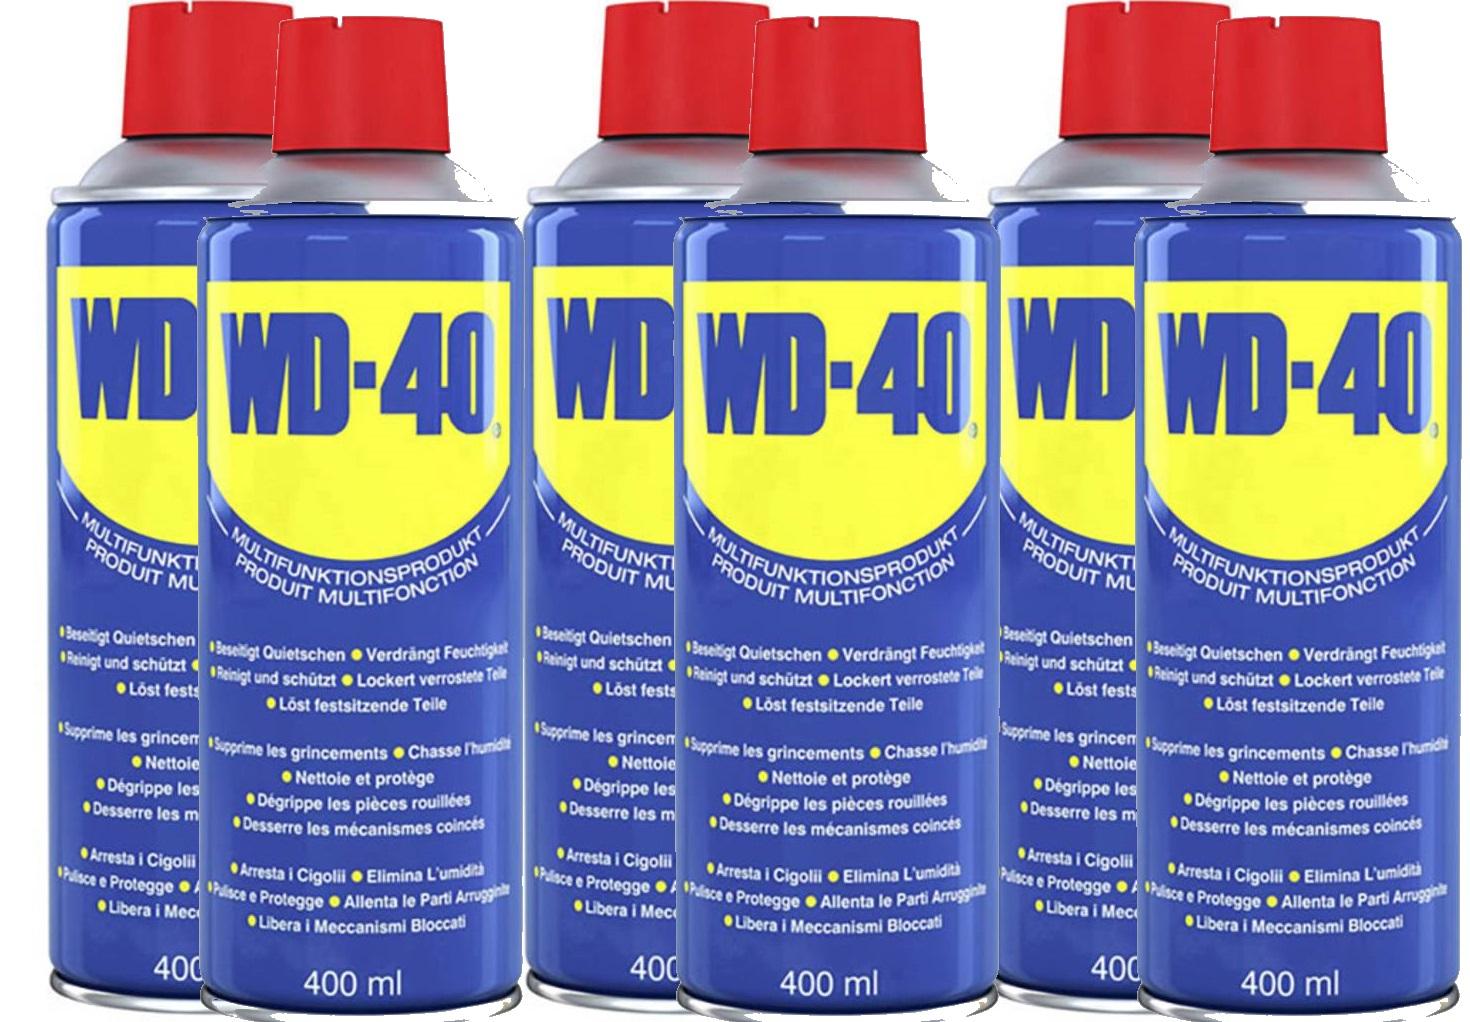 6x 400ml Wd 40 Multifunktionsöl Für 2142 Inklusive Versand 892